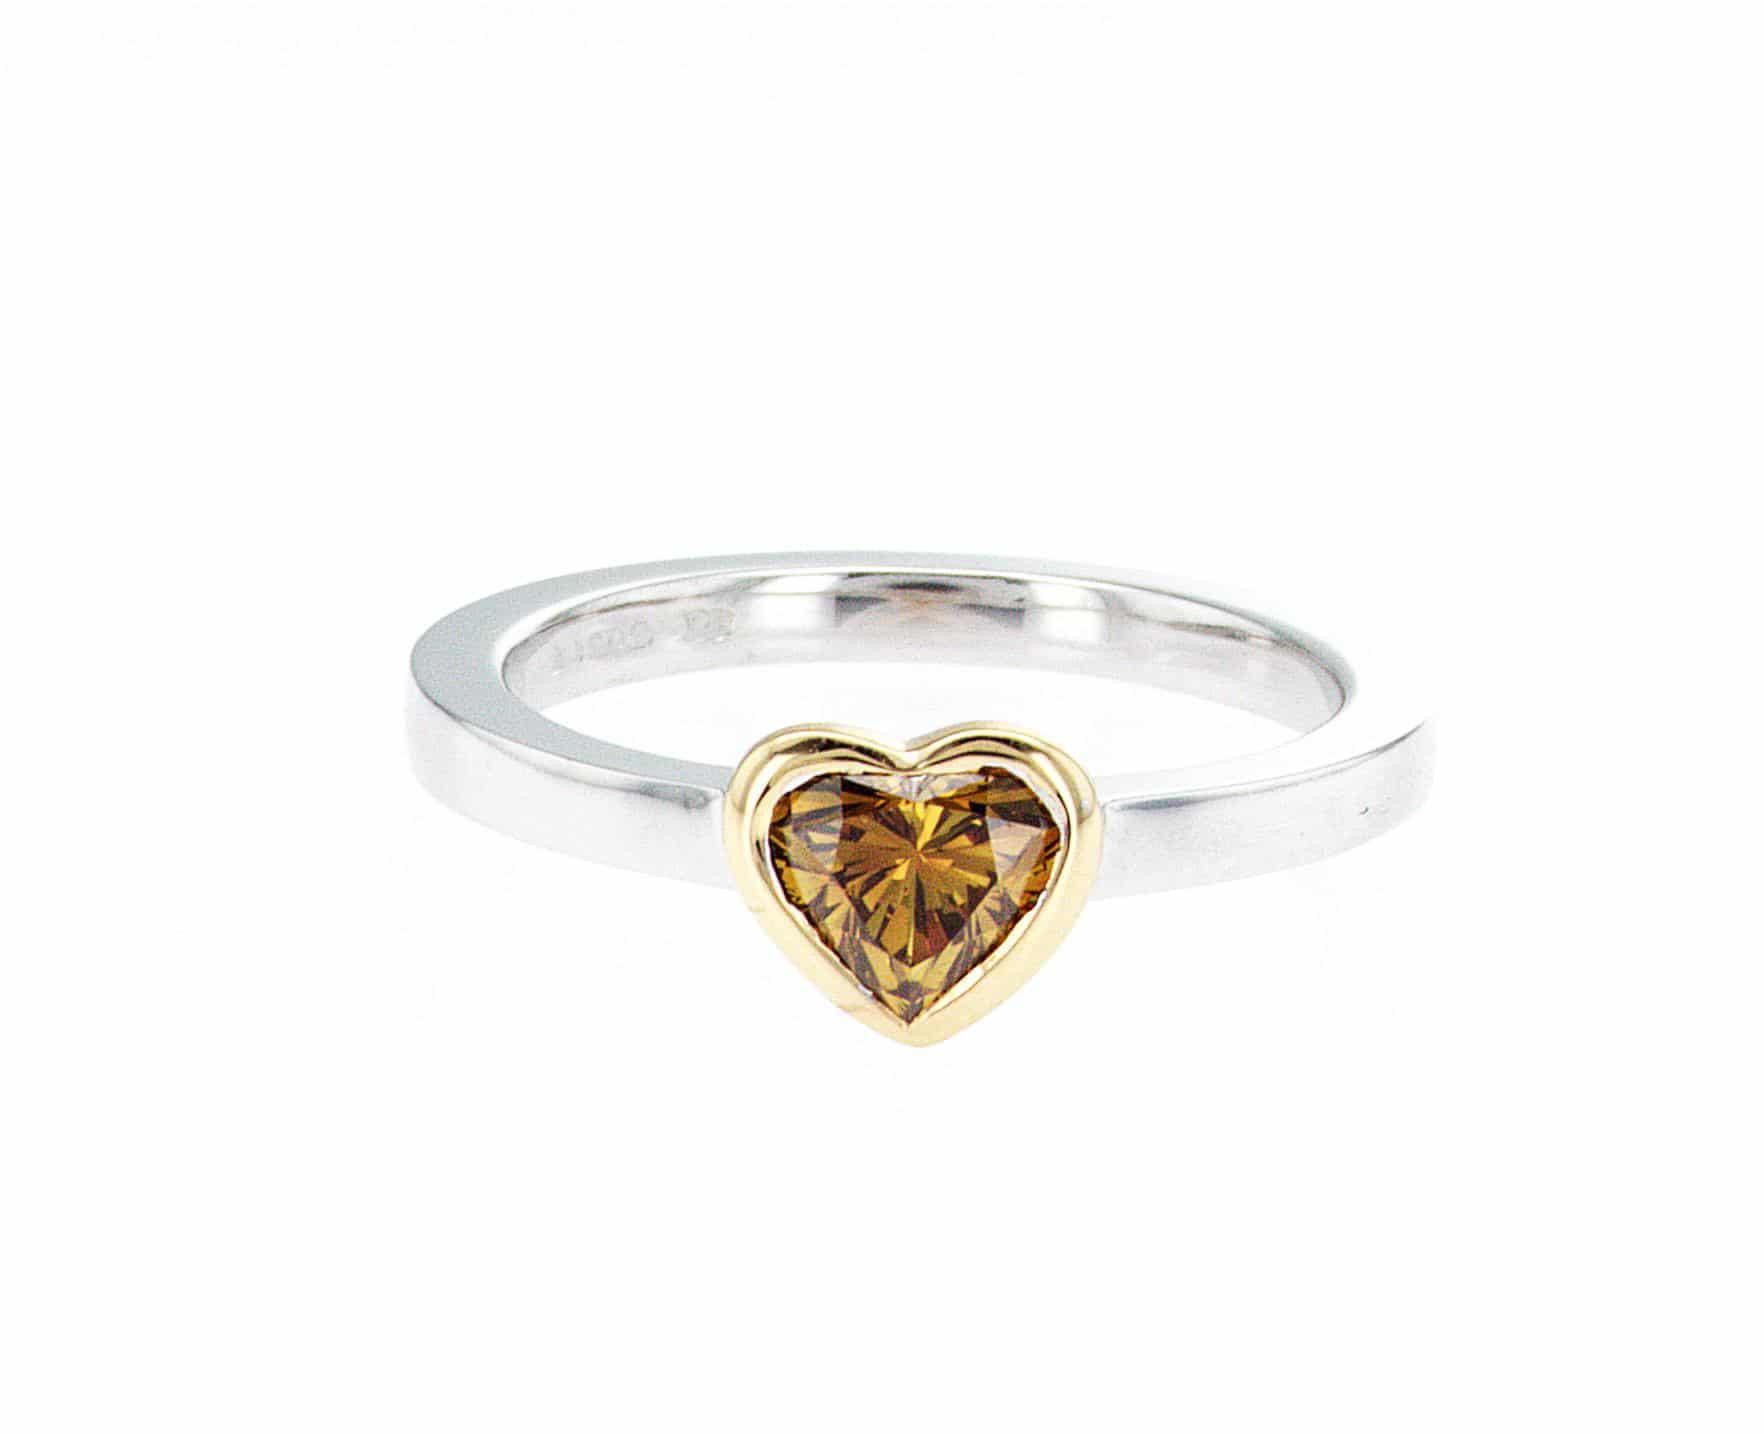 yellow heart shape diamond, white and yellow gold stacking ring